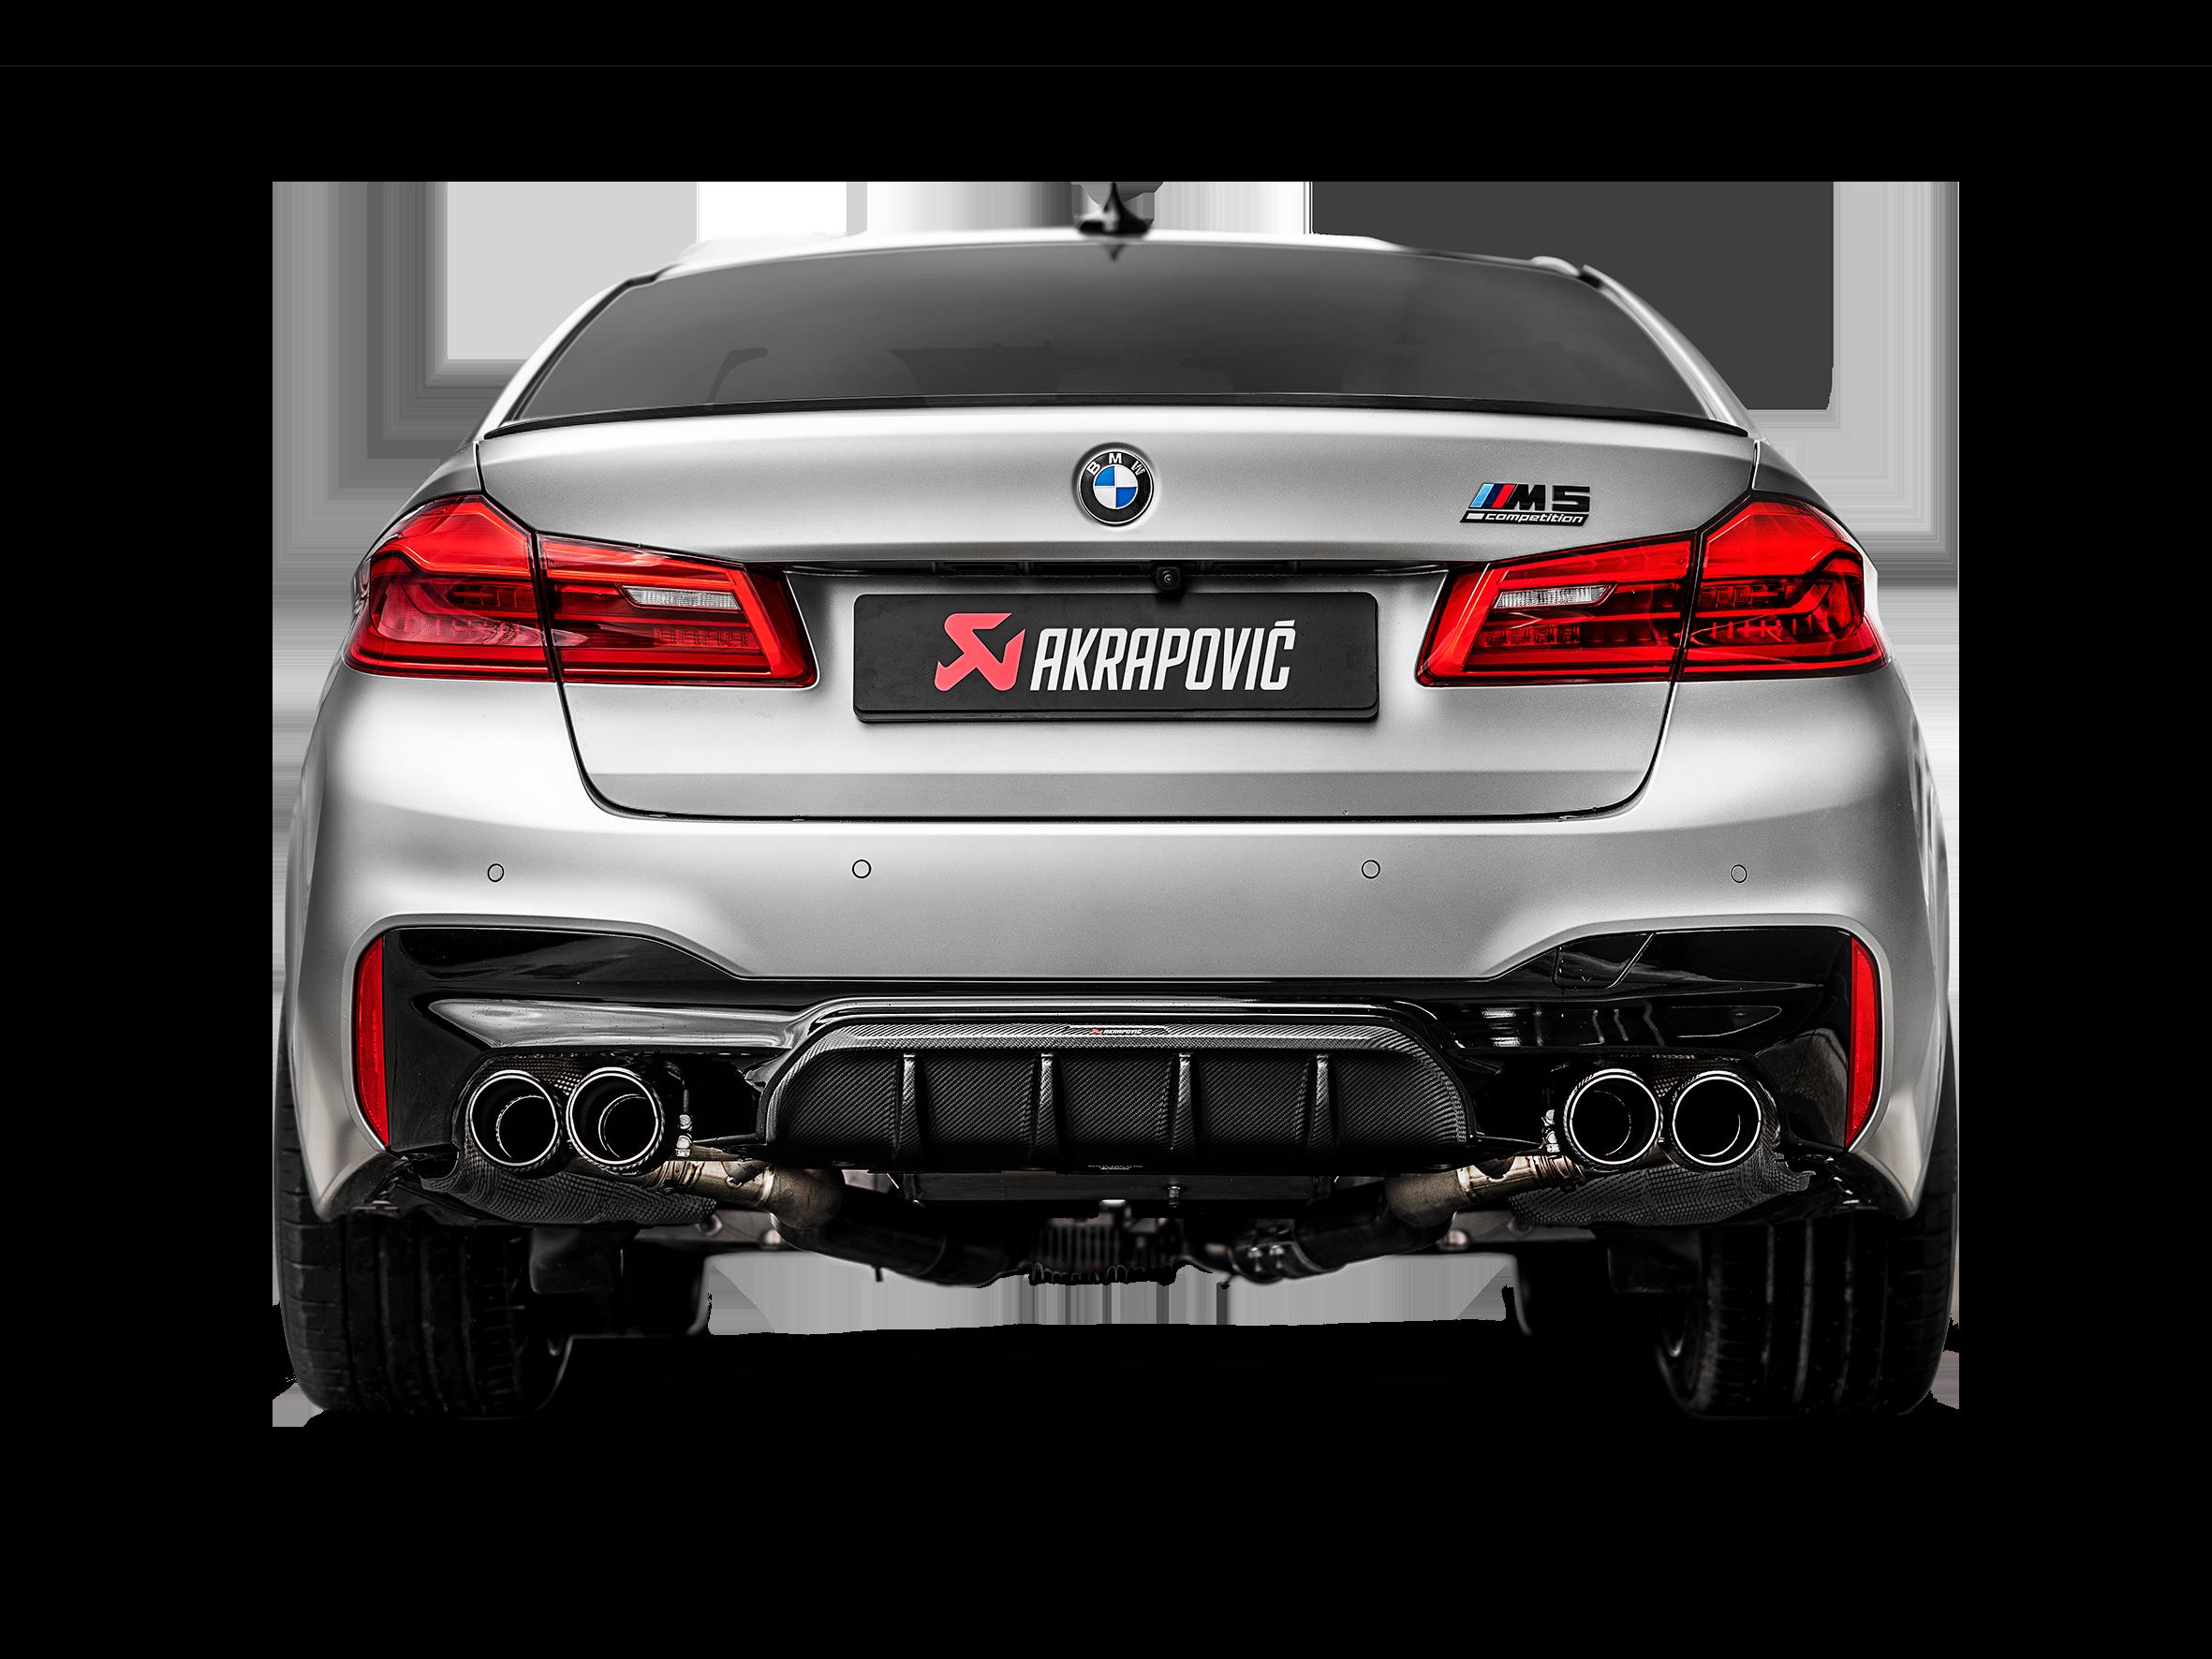 Bmw M5 M5 Competition F90 Opf Gpf 2019 Slip On Line Titanium Akrapovic Car Exhaust